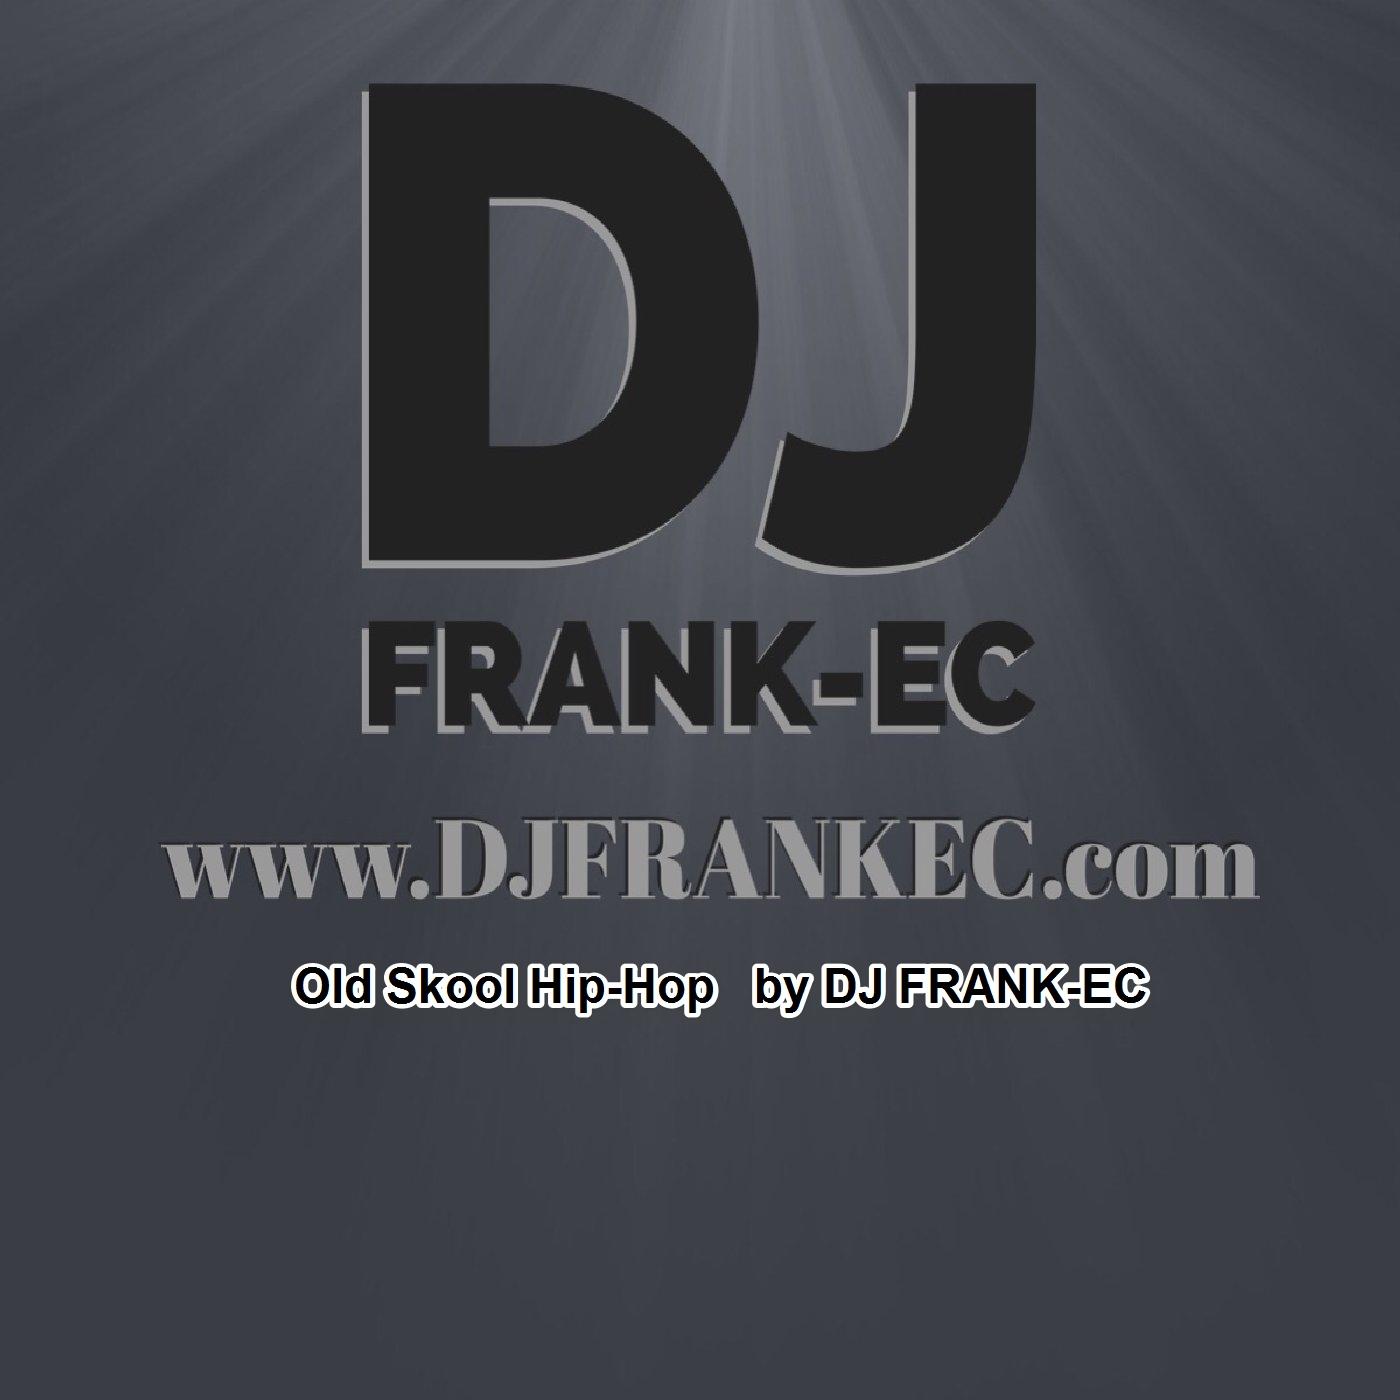 Old Skool Hip-Hop - DJ Frank-EC Podcast - Listen, Reviews, Charts